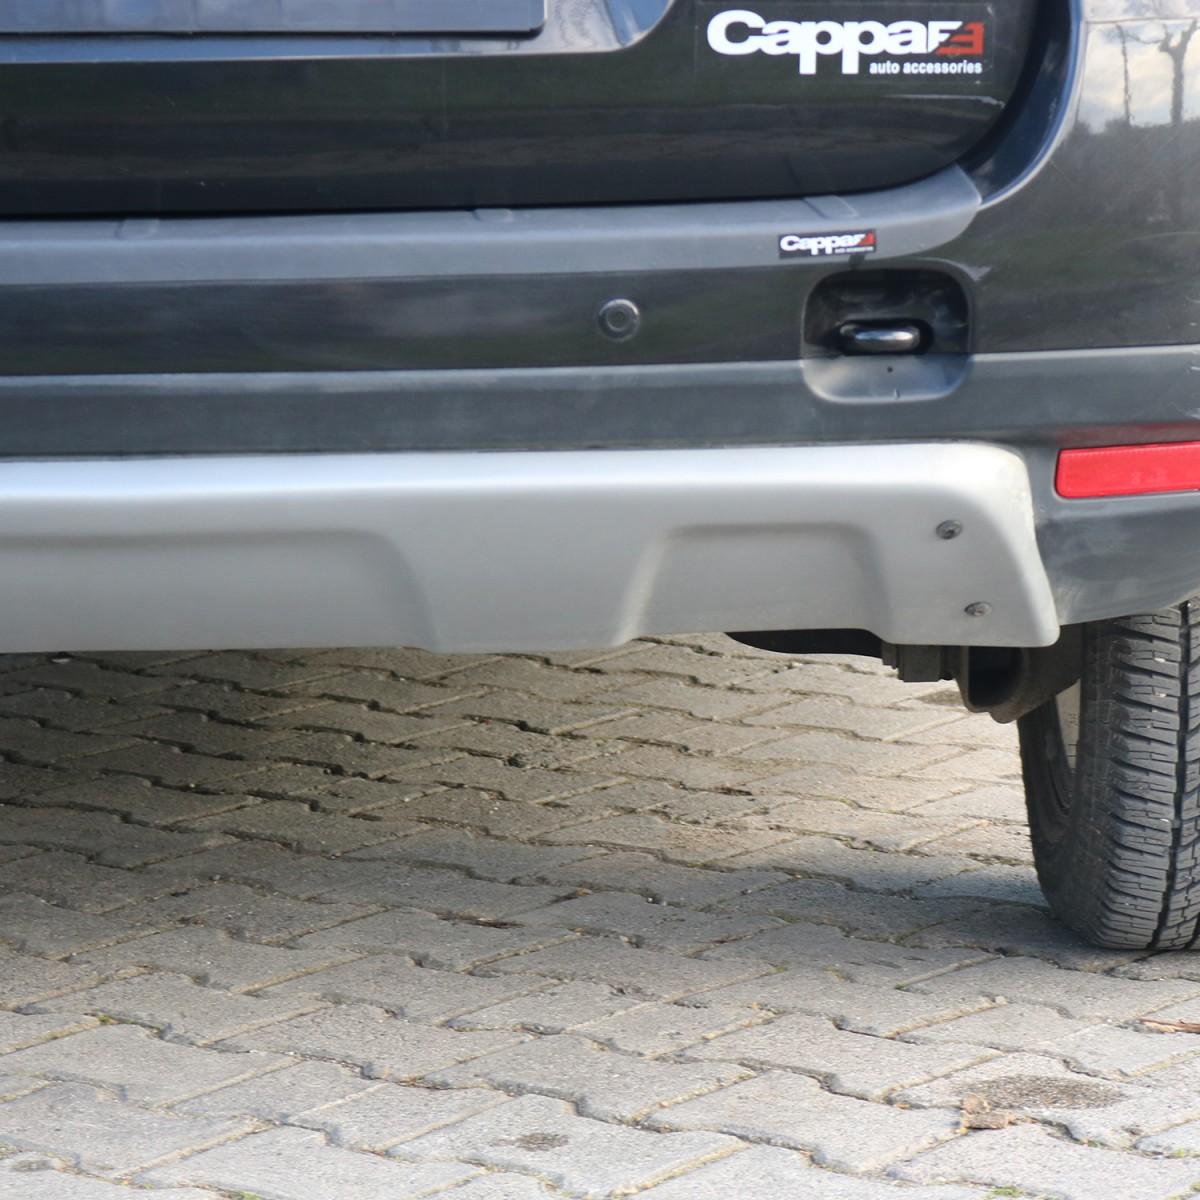 CAPPAFE Dacia Duster Arka Difüzör Mat Gri 2010 - 2017